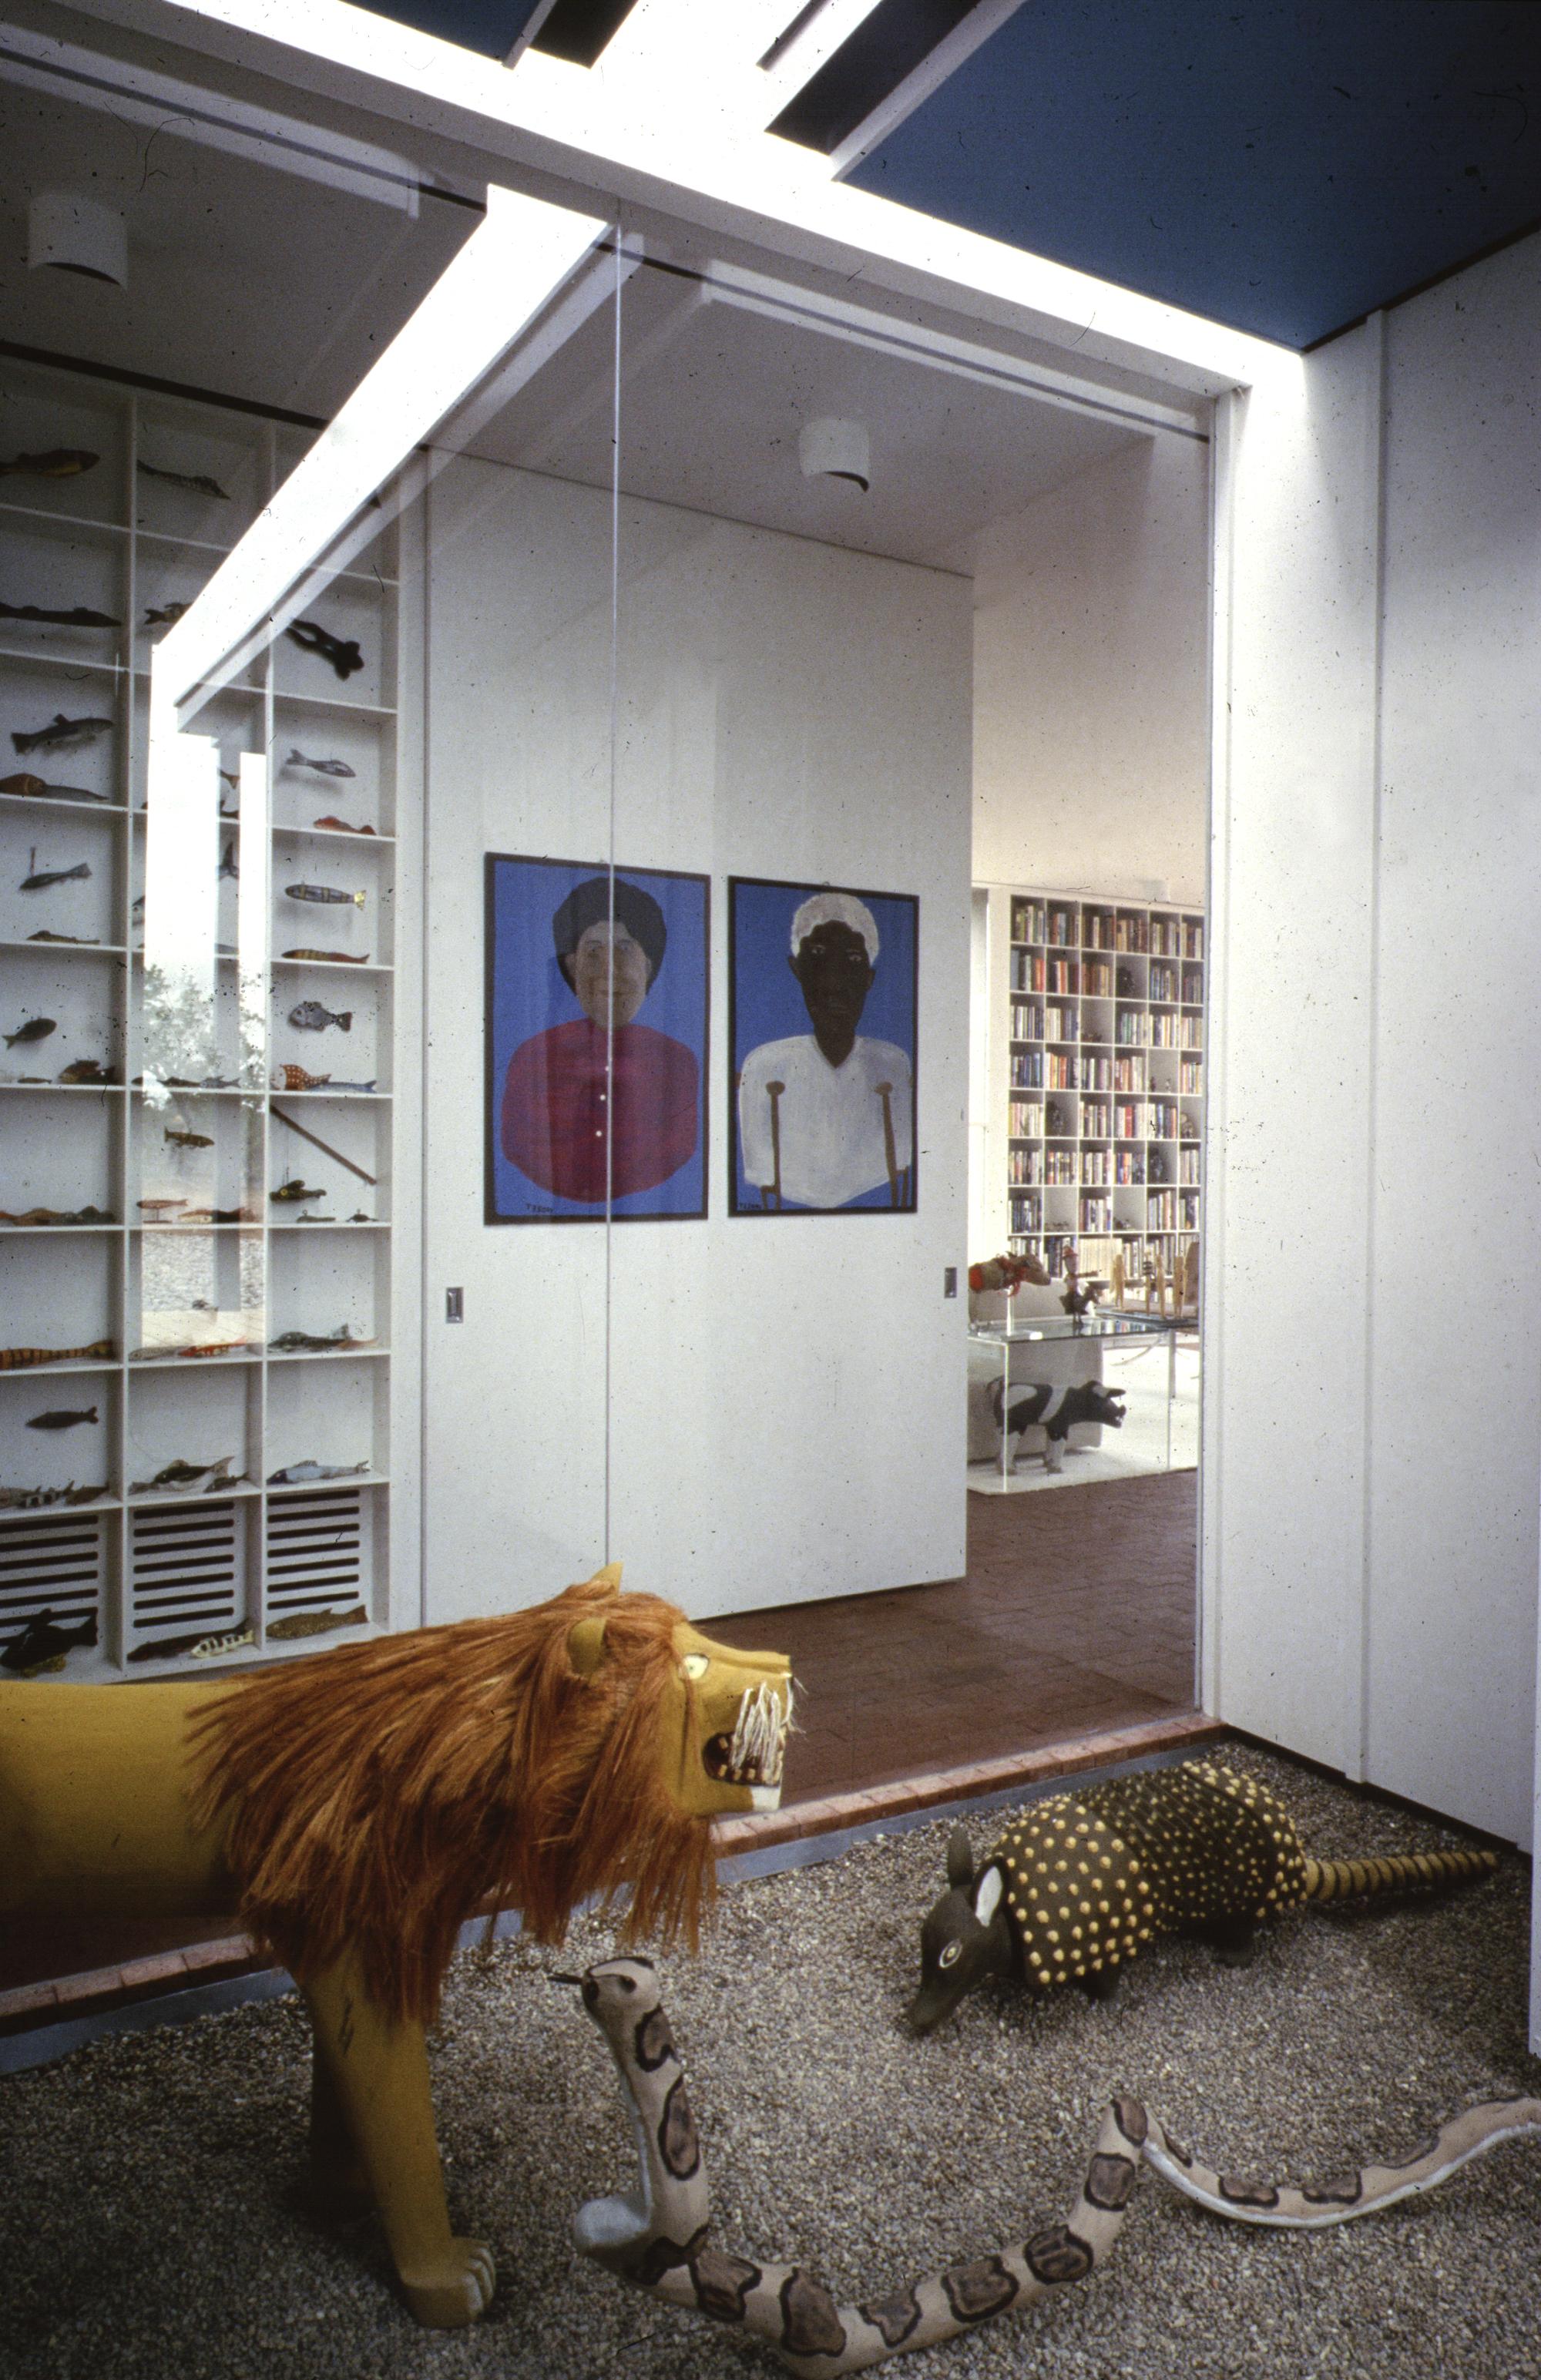 Rosenak Gallery, New Mexico.